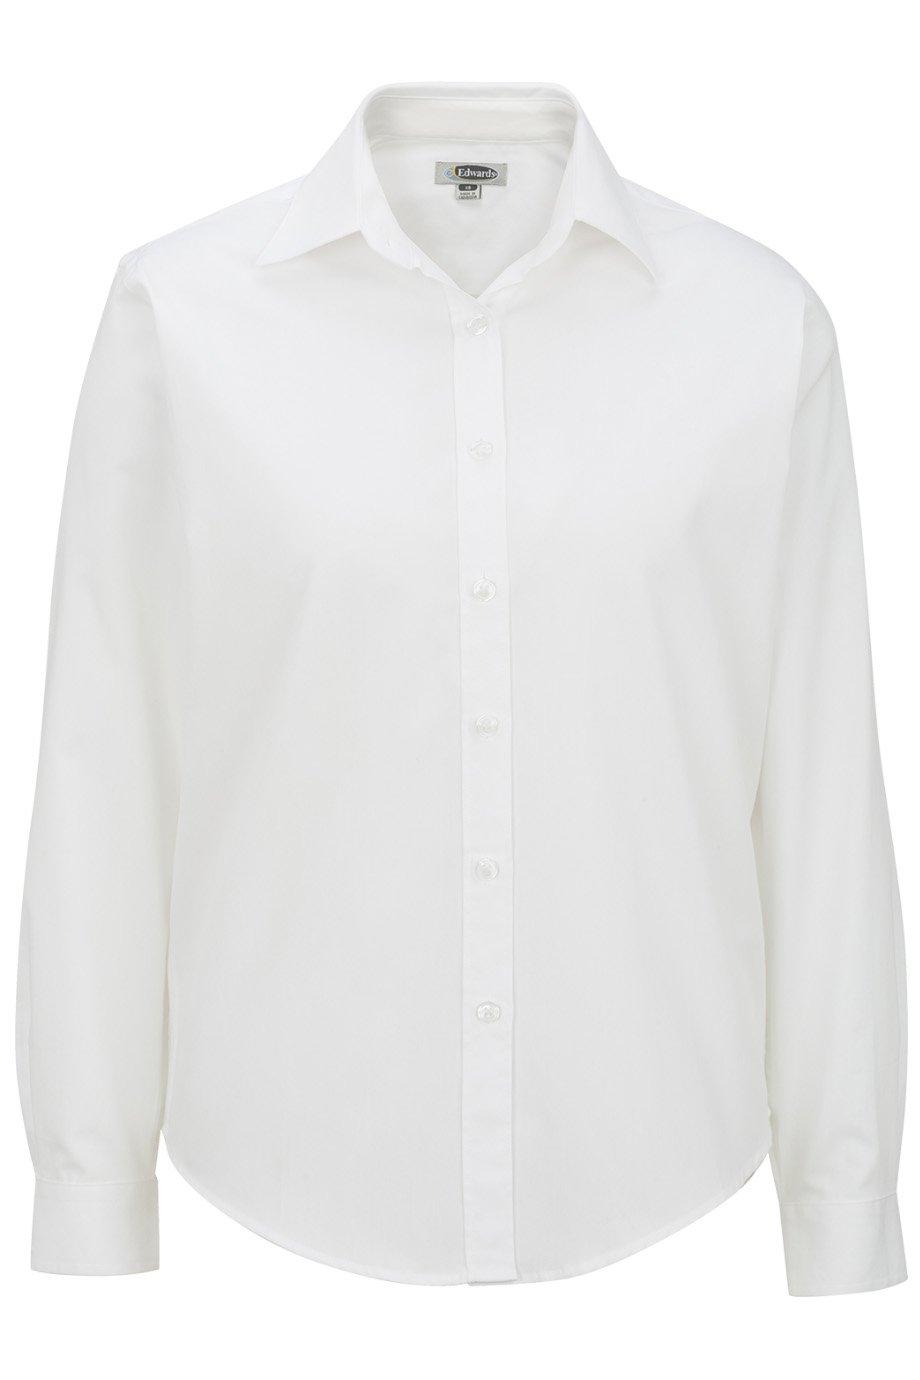 Edwards Garment Women's Pinpoint Long Sleeve Oxford Shirt, White, XX-Large